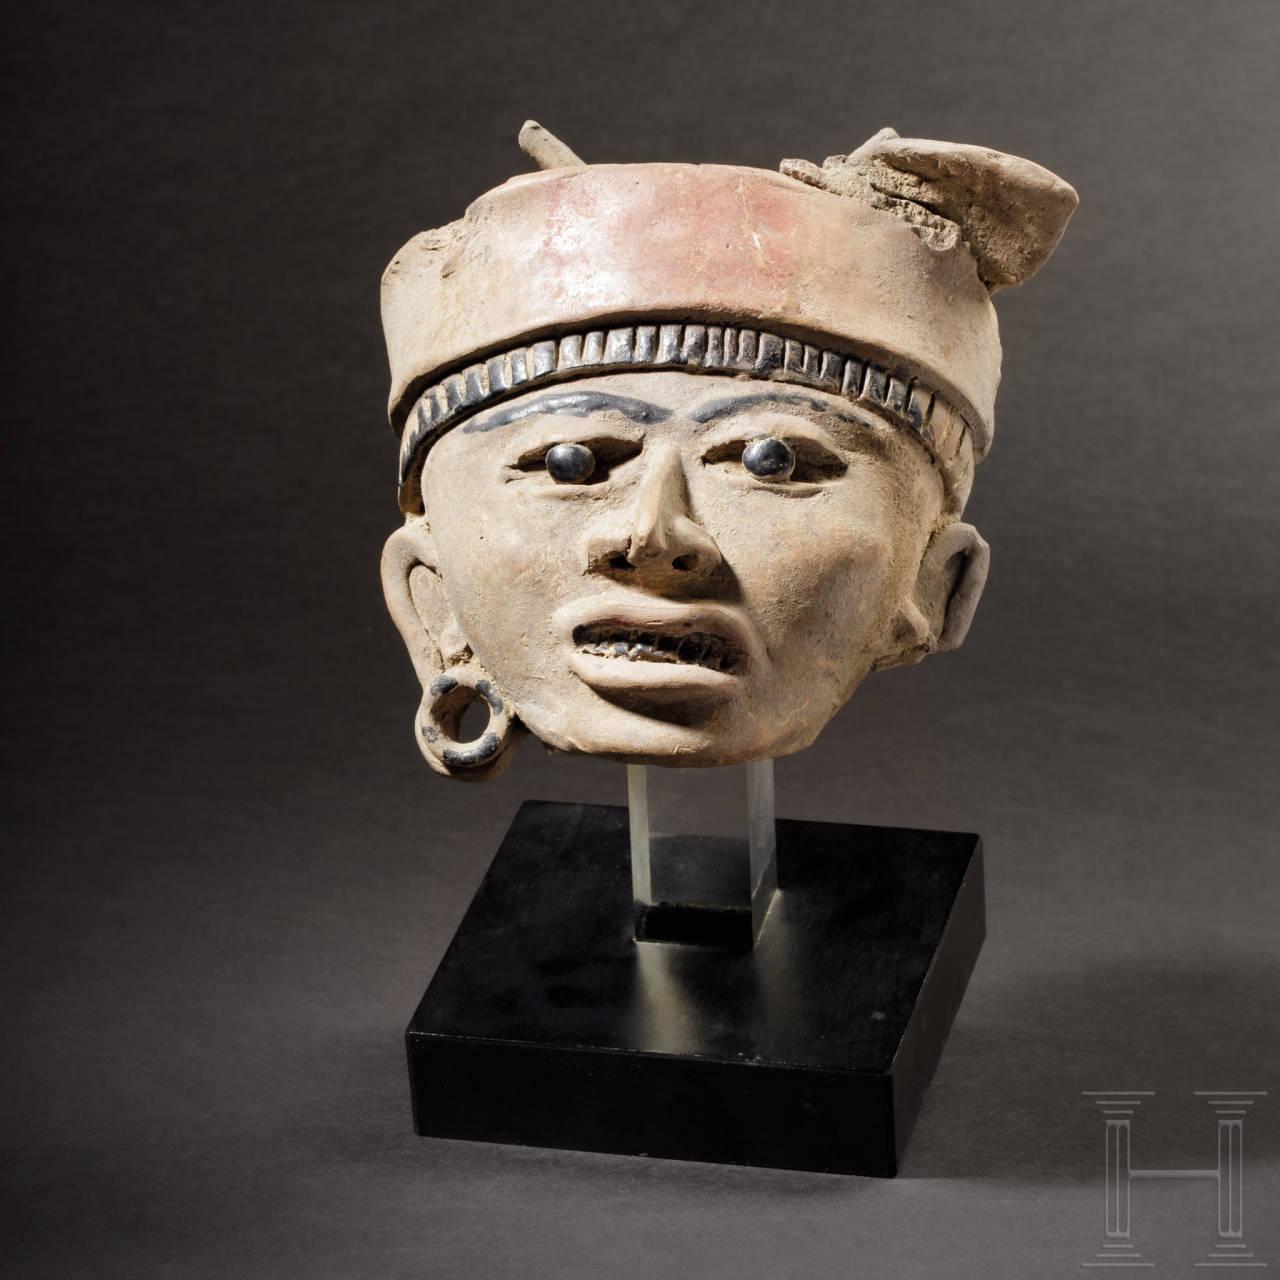 Veracruz Terrakotta-Kopf eines Kriegers, Mexico, Remojadas-Kultur, ca. 100 v. Chr. - 800 n. Chr.